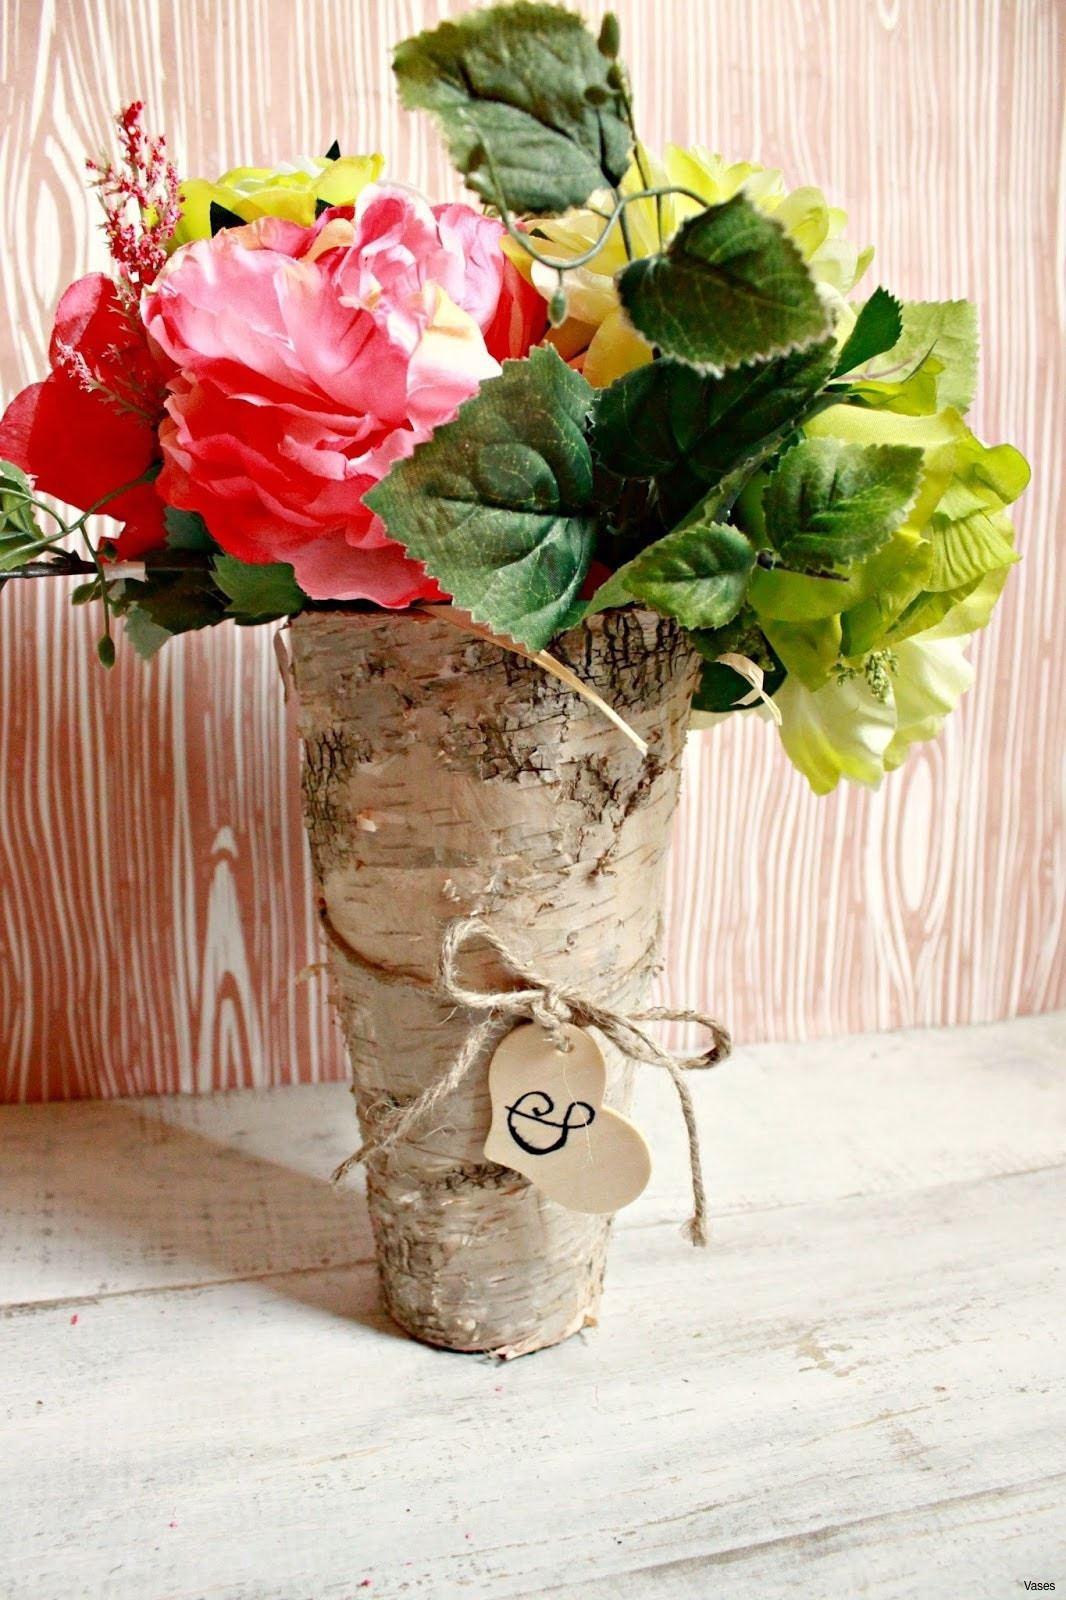 wedding vase decorations of fresh flowers for wedding h vases diy wood vase i 0d base turntable inside fresh flowers for wedding h vases diy wood vase i 0d base turntable ideas of wooden halloween decorations